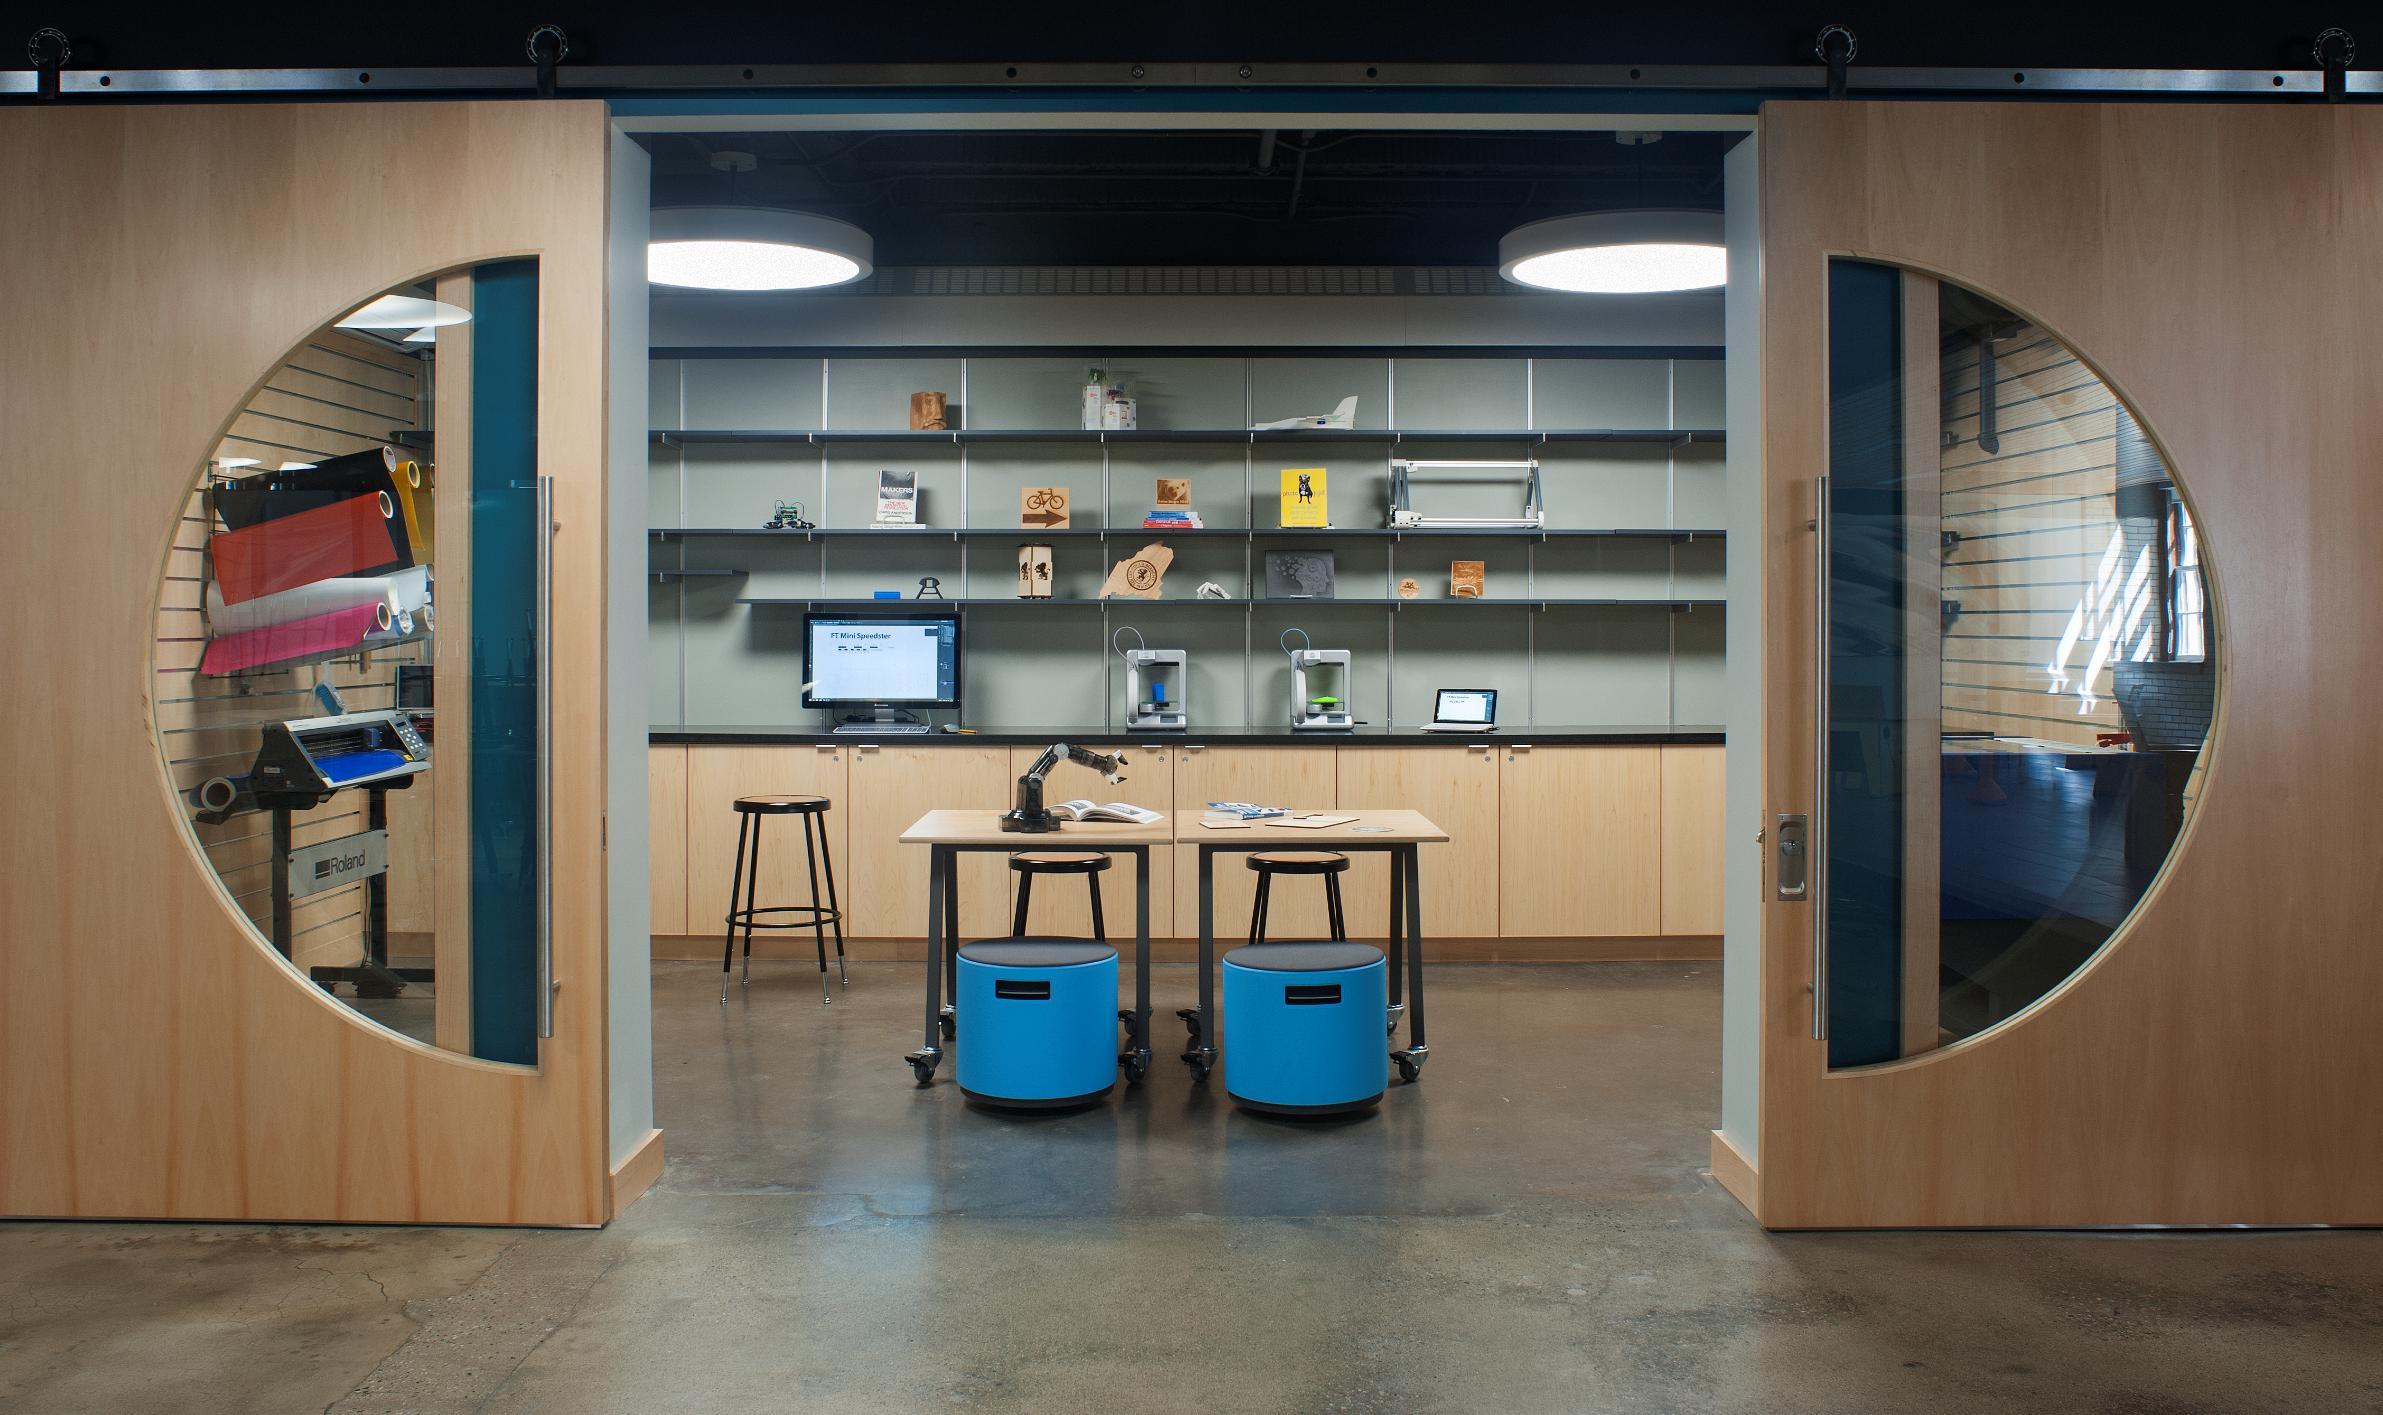 Makerspace, IDEAS, Gould Academy, School, classroom, technology classroom